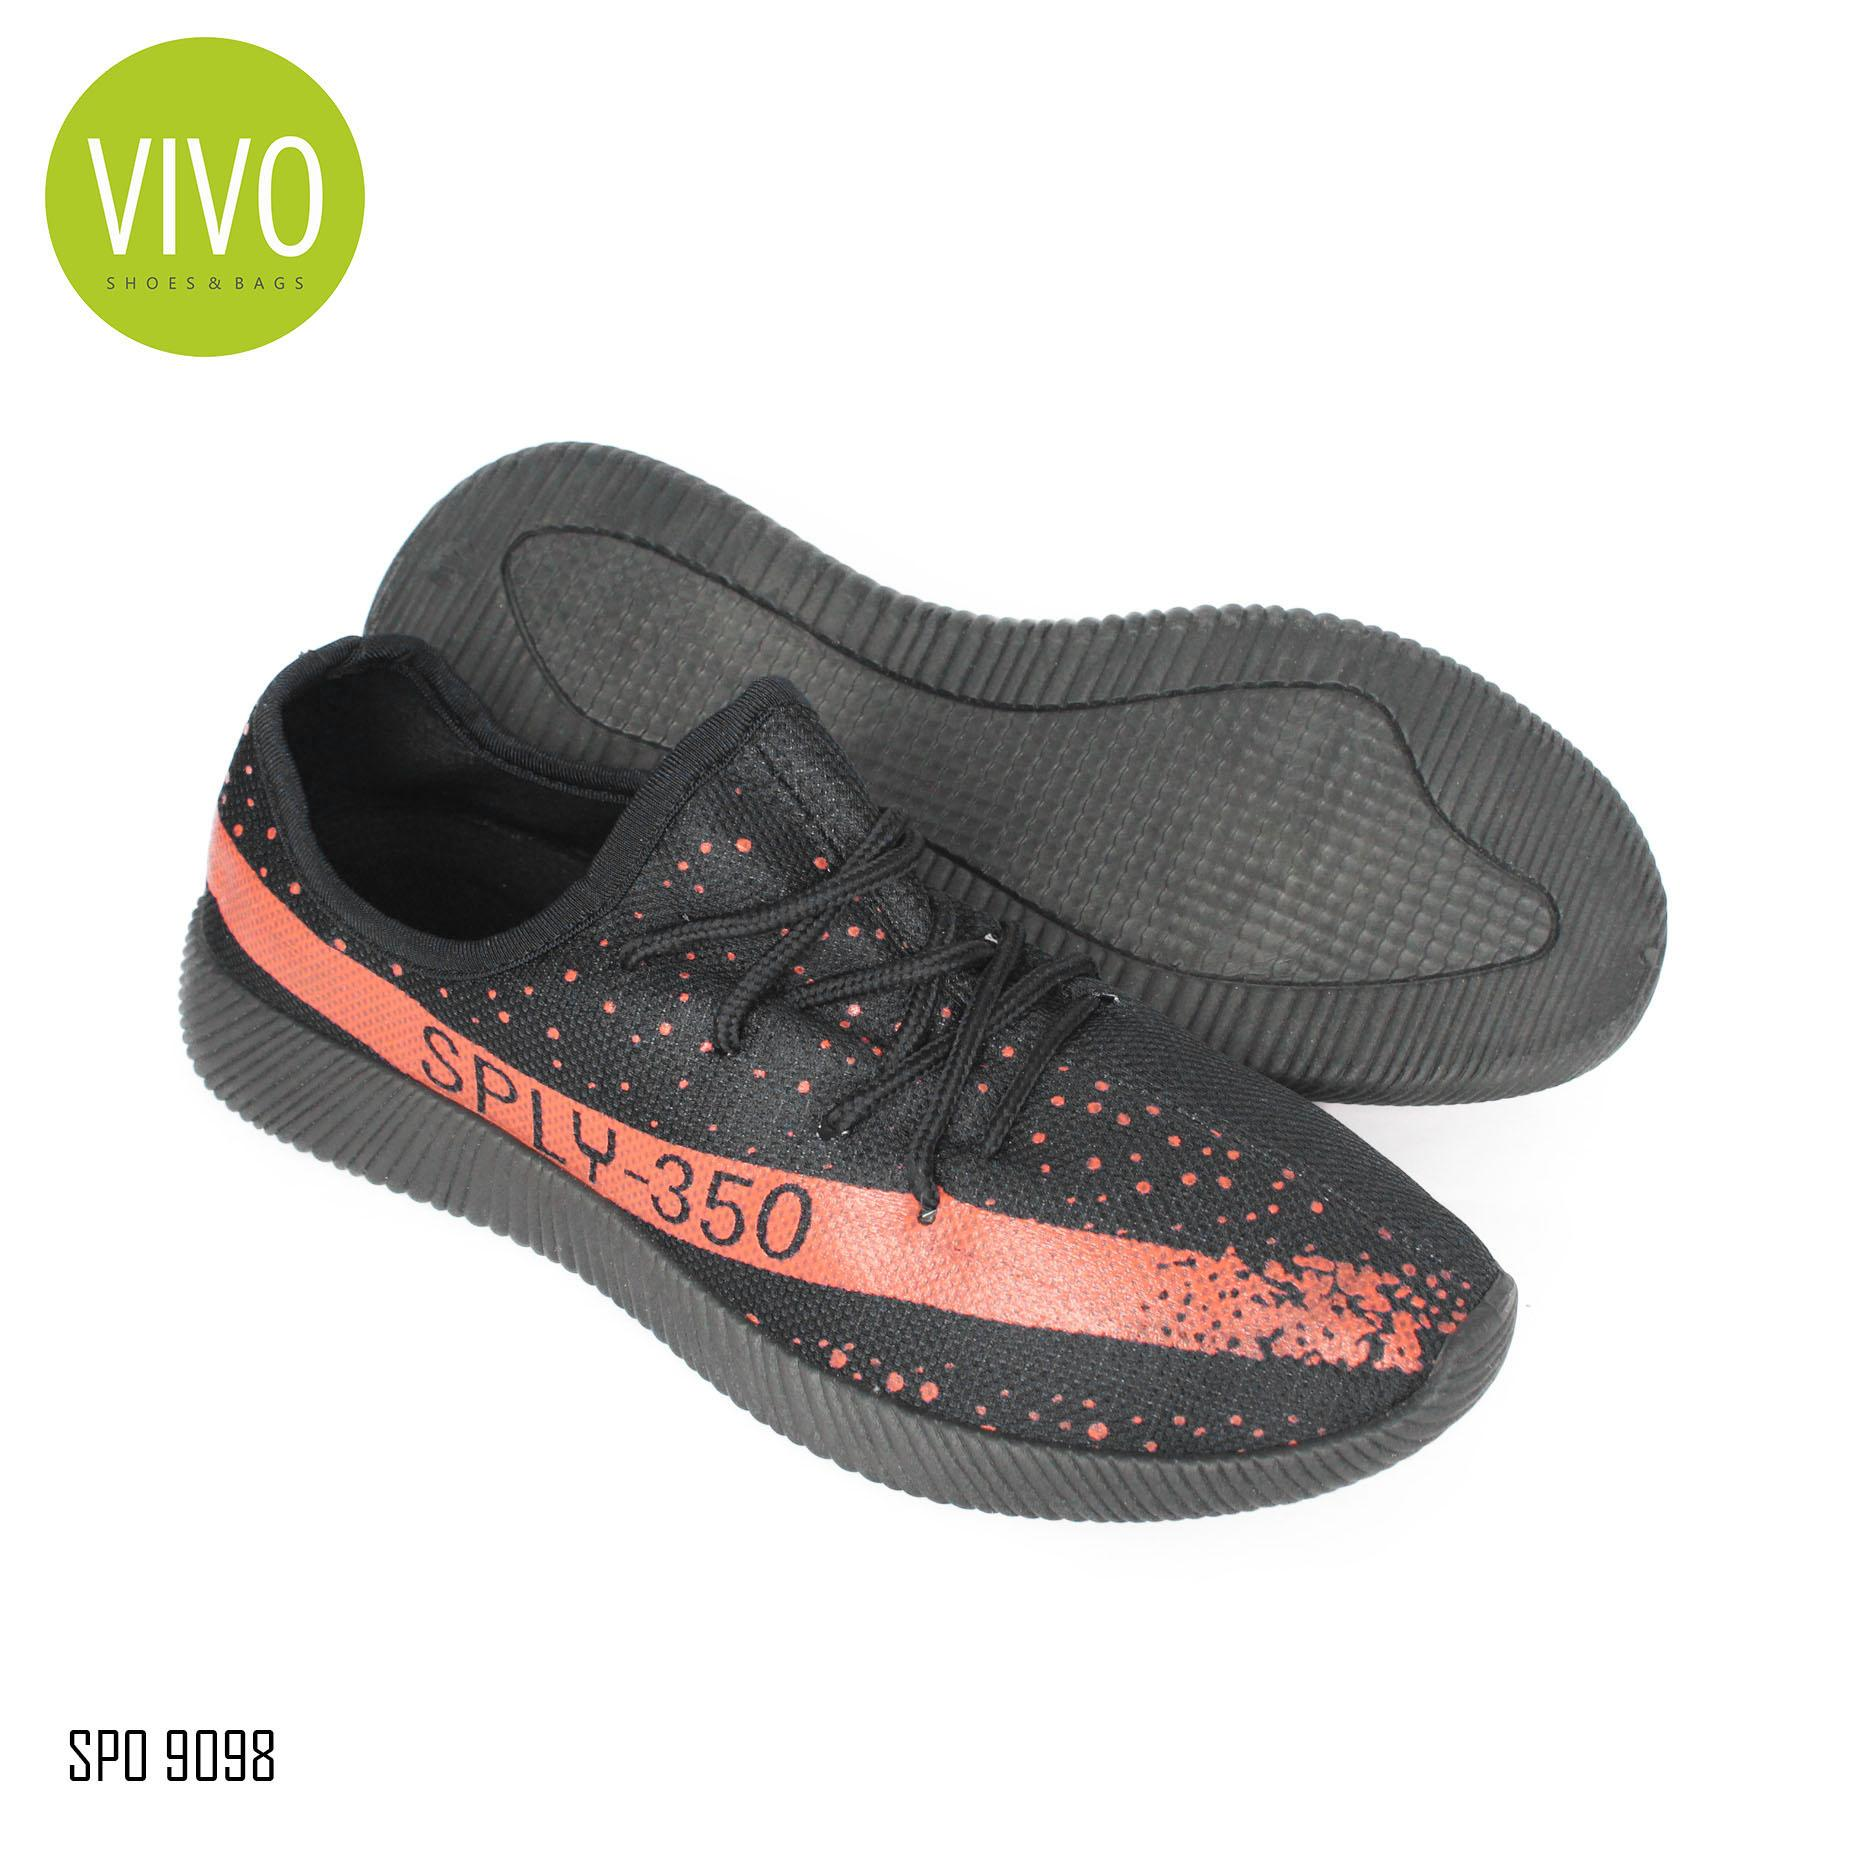 Detail Gambar Vivo Fashion Sepatu Casual Pria/Sepatu Slip On Pria/Sepatu Sneakers Pria